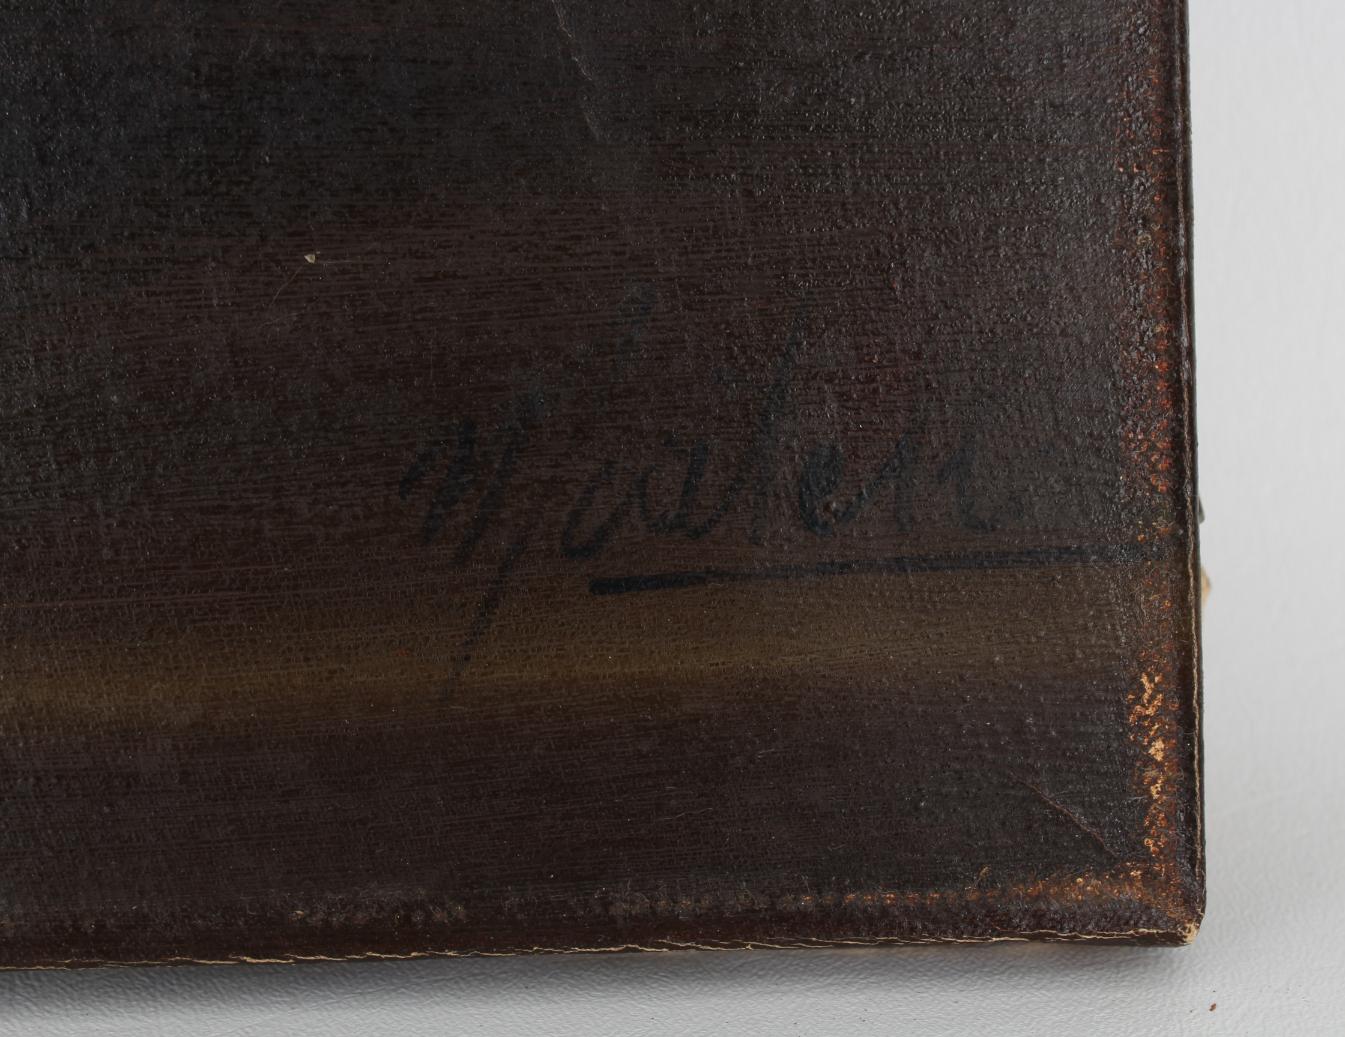 20th C. 'Martelli' Signed Still Life - Image 3 of 4